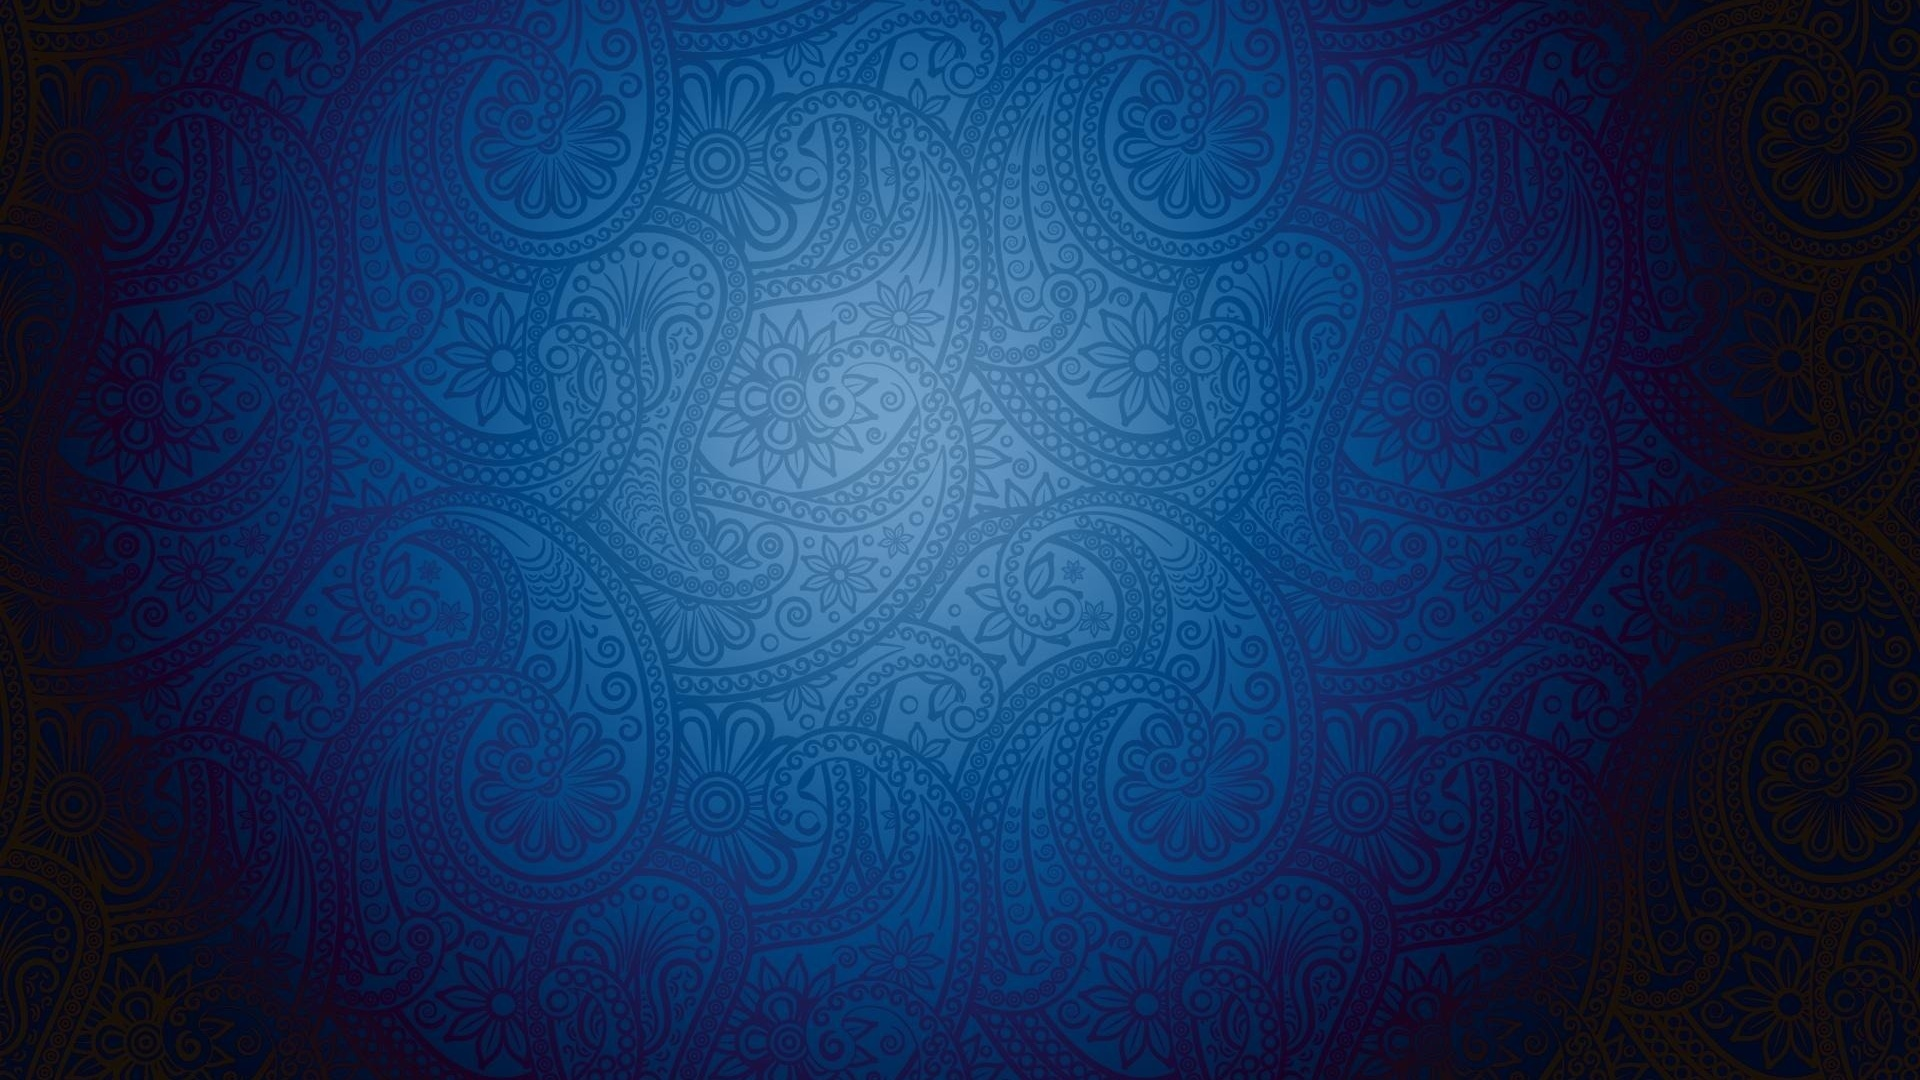 ... Background Patterns; Background Patterns